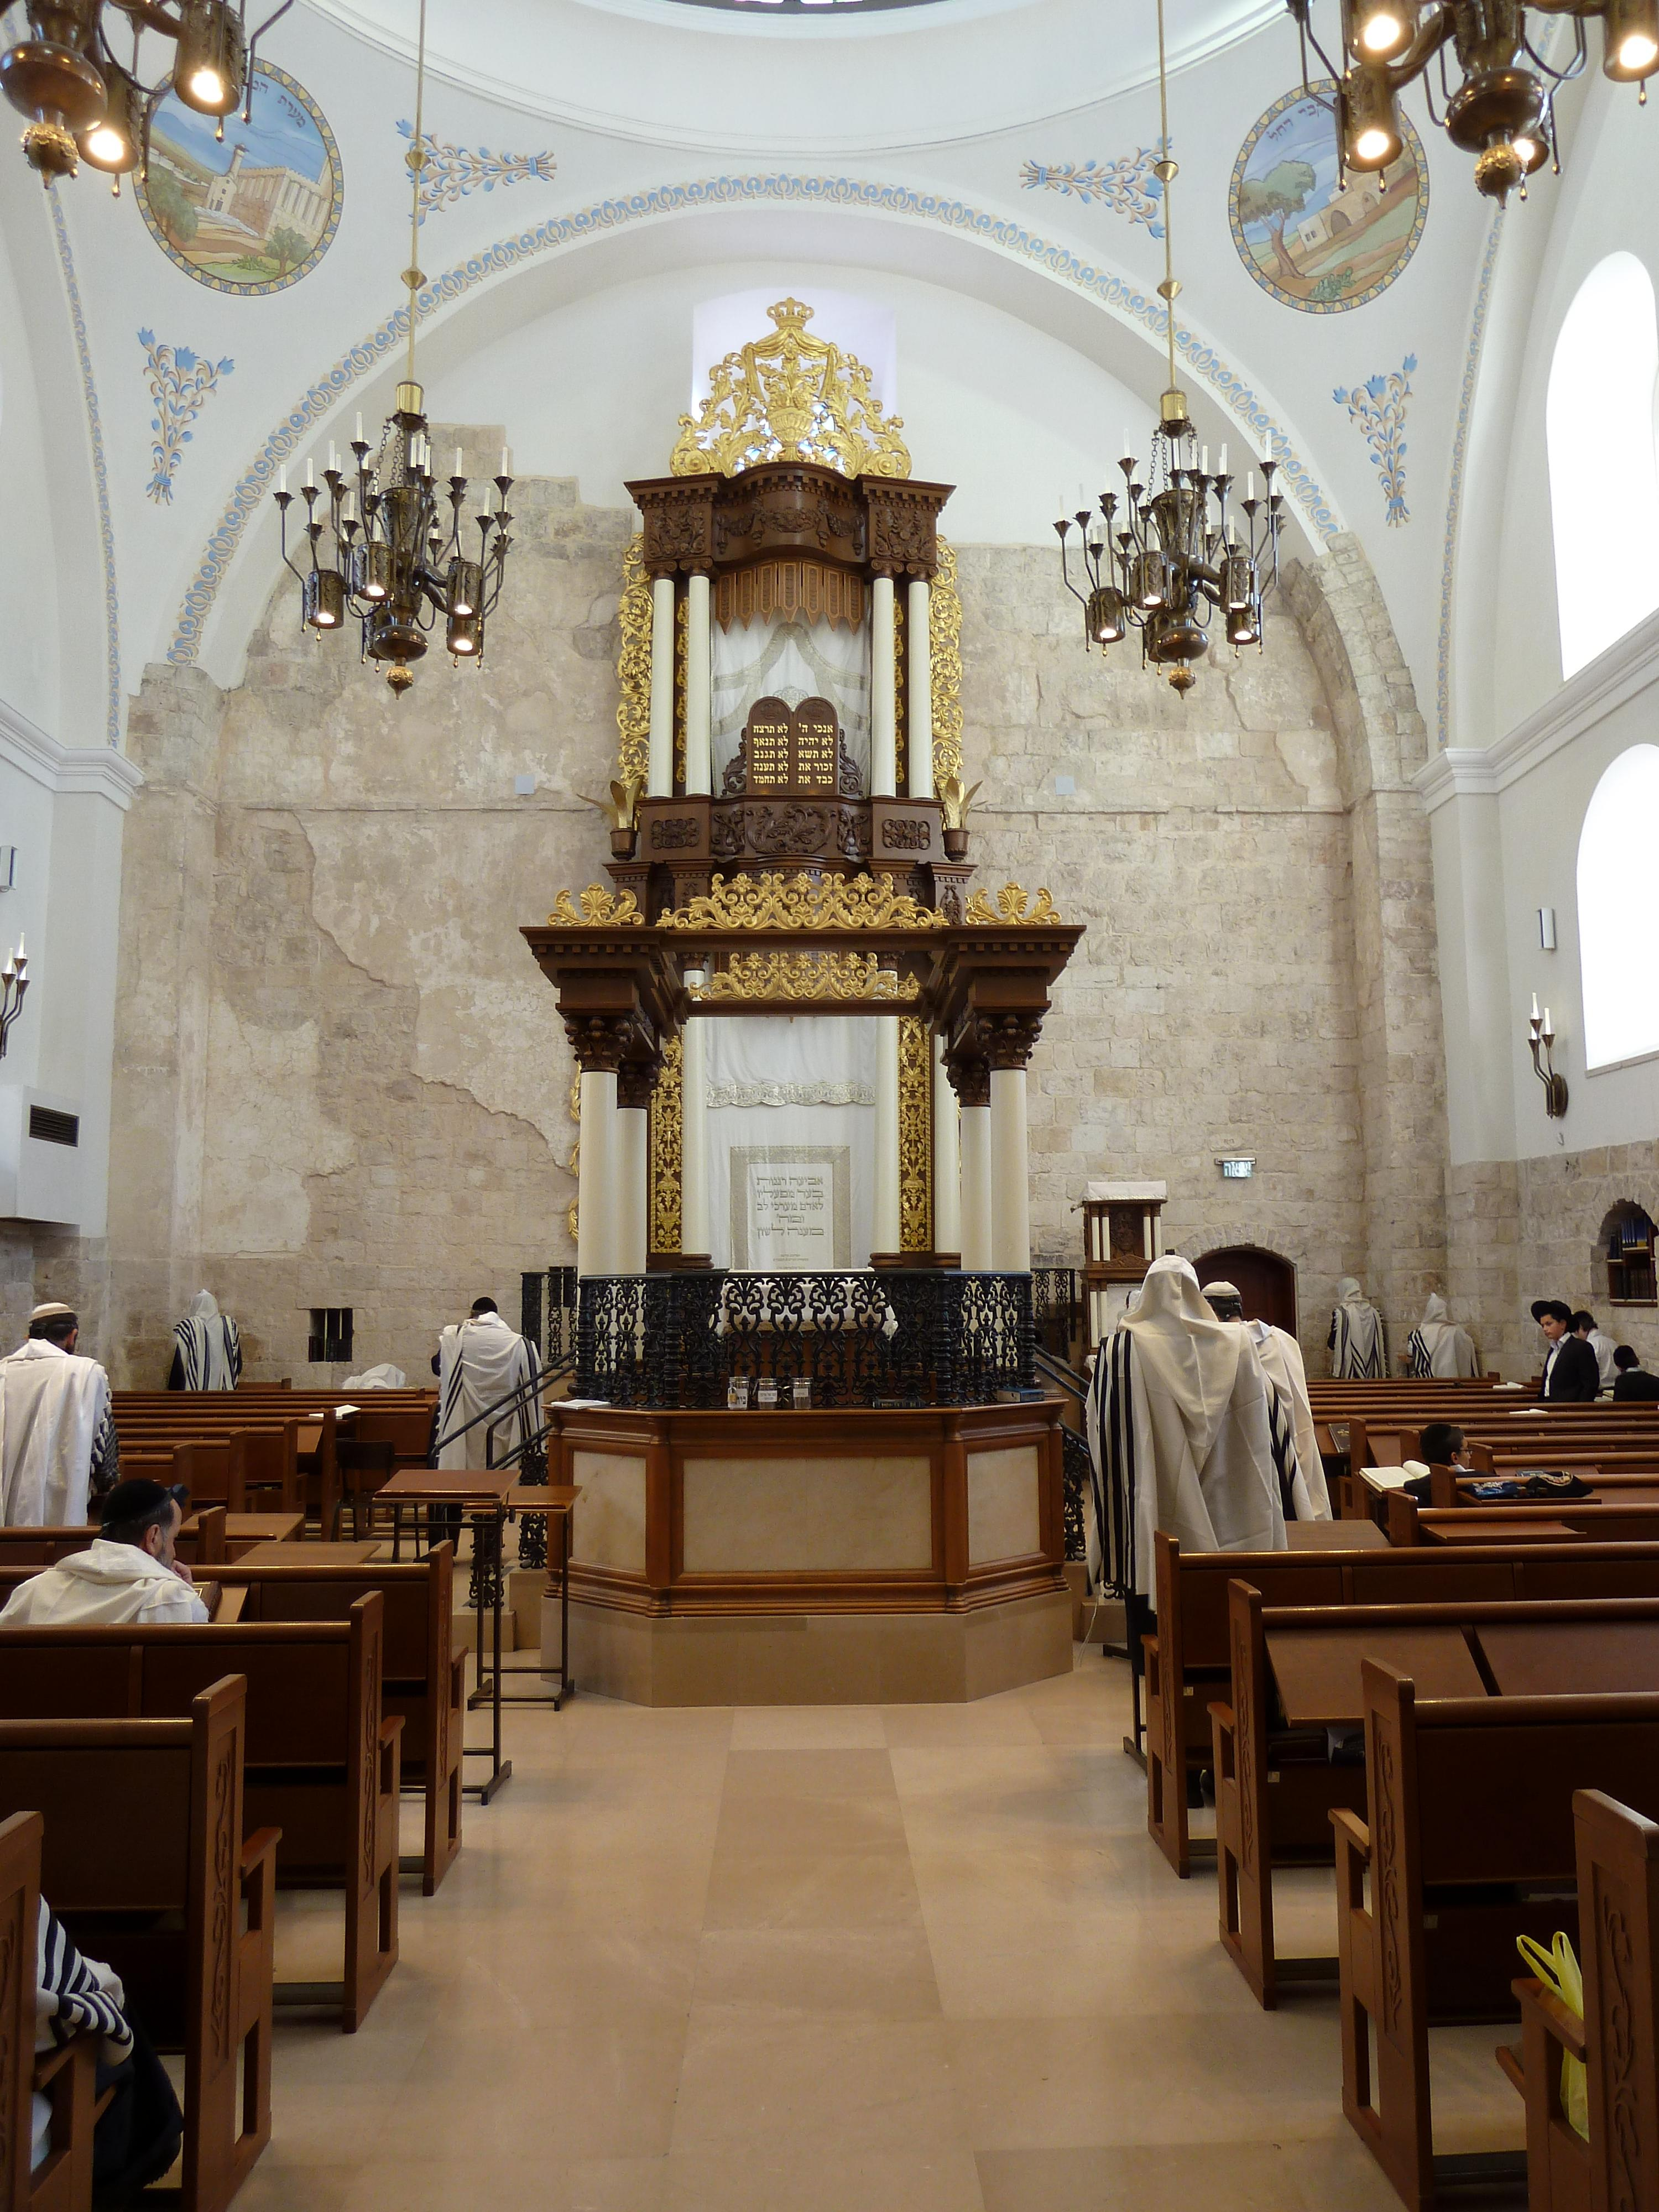 Beit Hillel Israel  city pictures gallery : ... Hillel ben David Greg Killian And Micah ben Hillel | Esnoga Beit